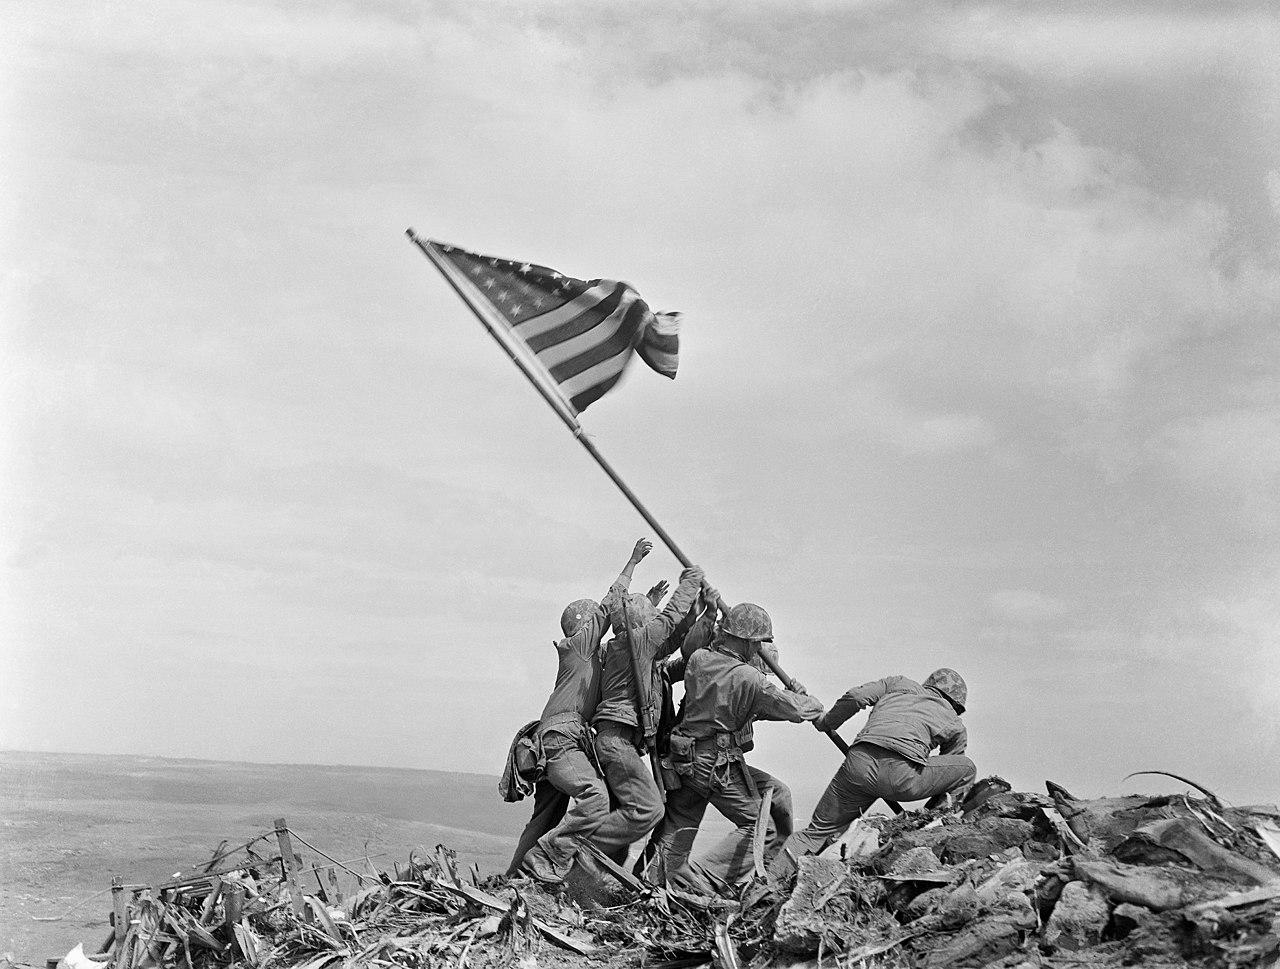 Raising of the Flag on Iwo Jima by Joe Rosenthal